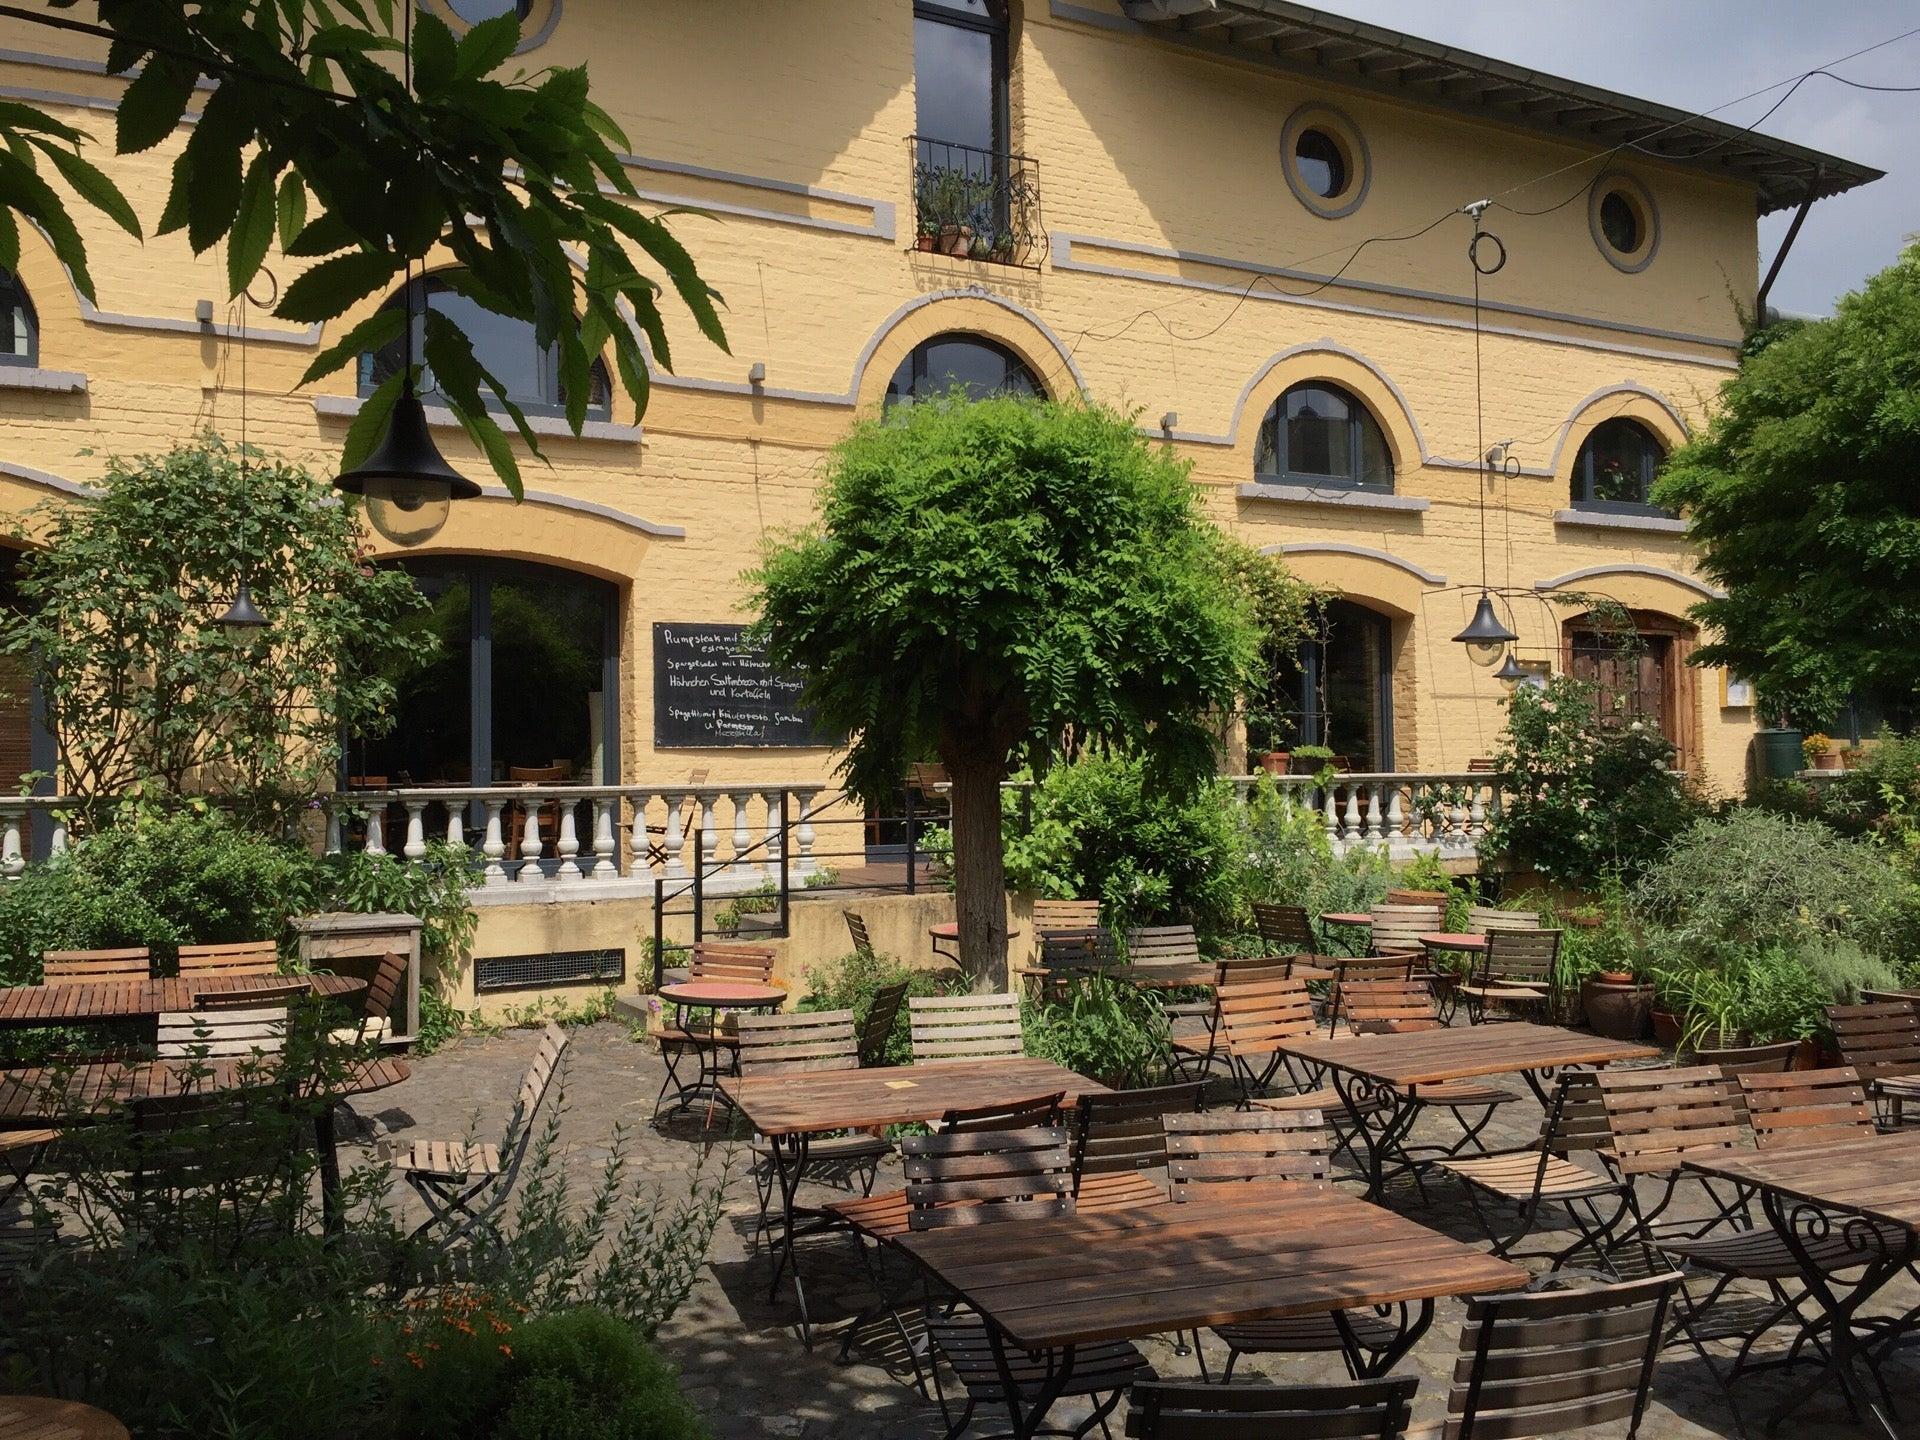 Café Kosmopolit in Krefeld - speisekarte.de